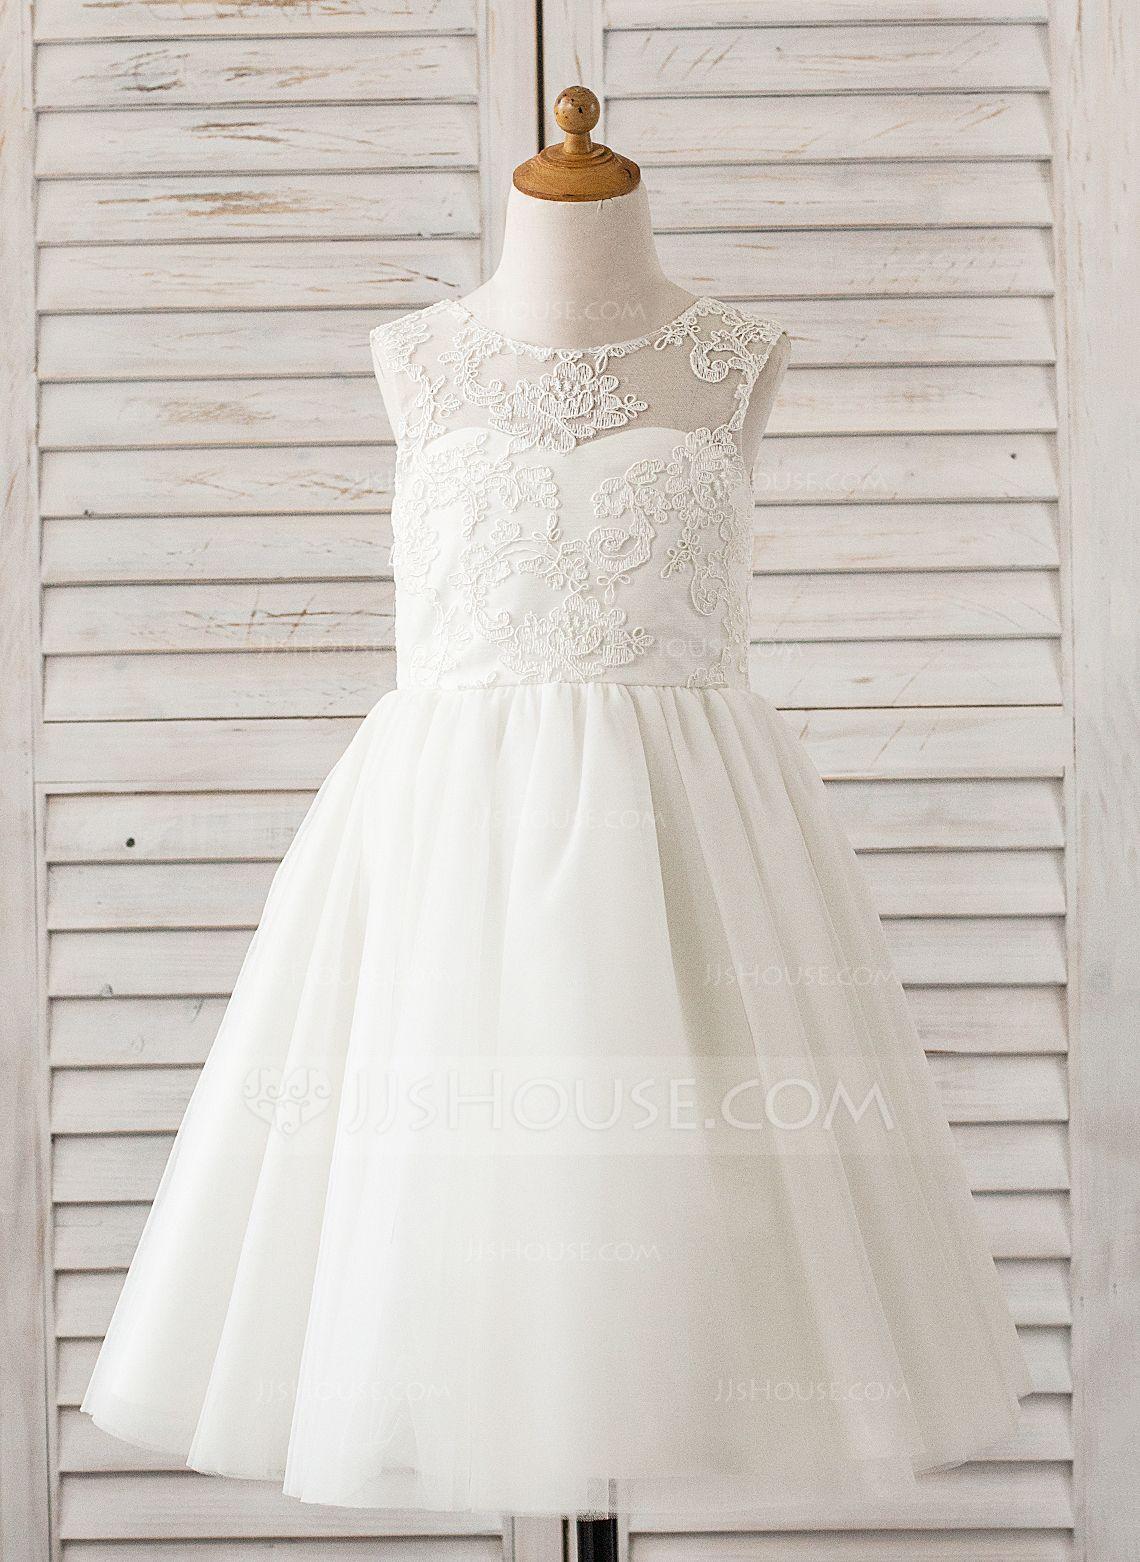 cda42ea751b A-Line Princess Tea-length Flower Girl Dress - Tulle Lace Sleeveless Scoop  Neck (010091381) - JJsHouse